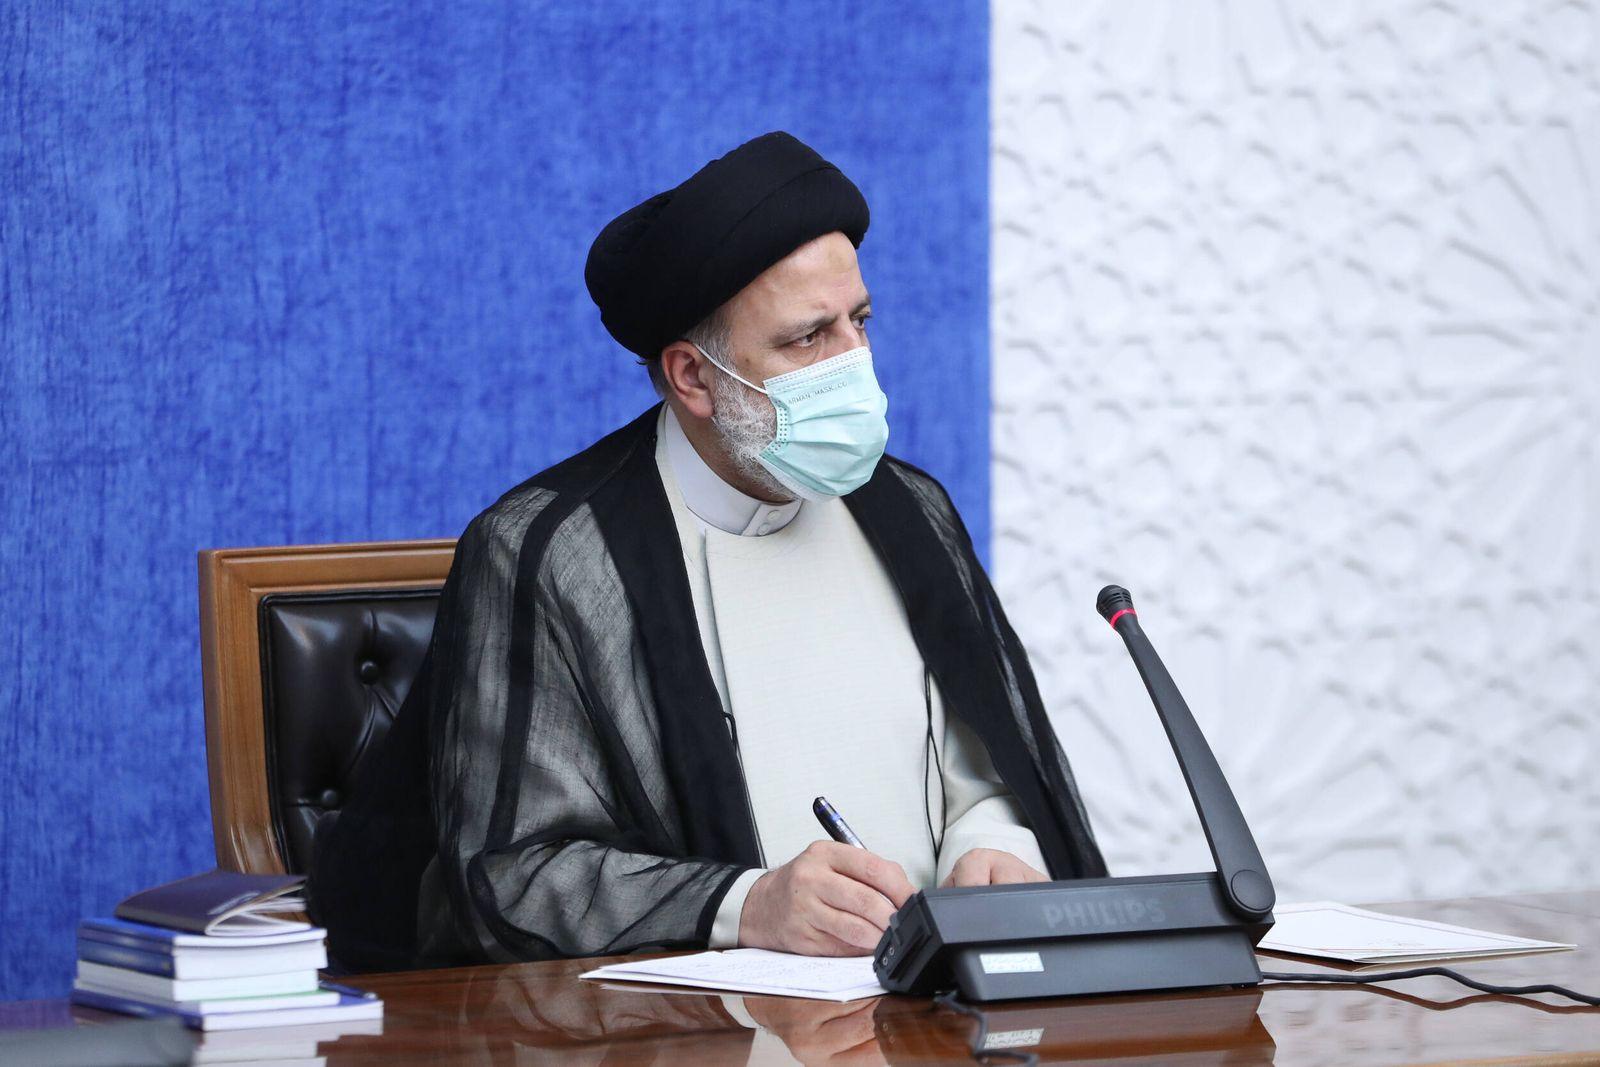 August 10, 2021, Tehran, Tehran, Iran: Iranian President EBRAHIM RAISI speaks during an emergency meeting of the Corona